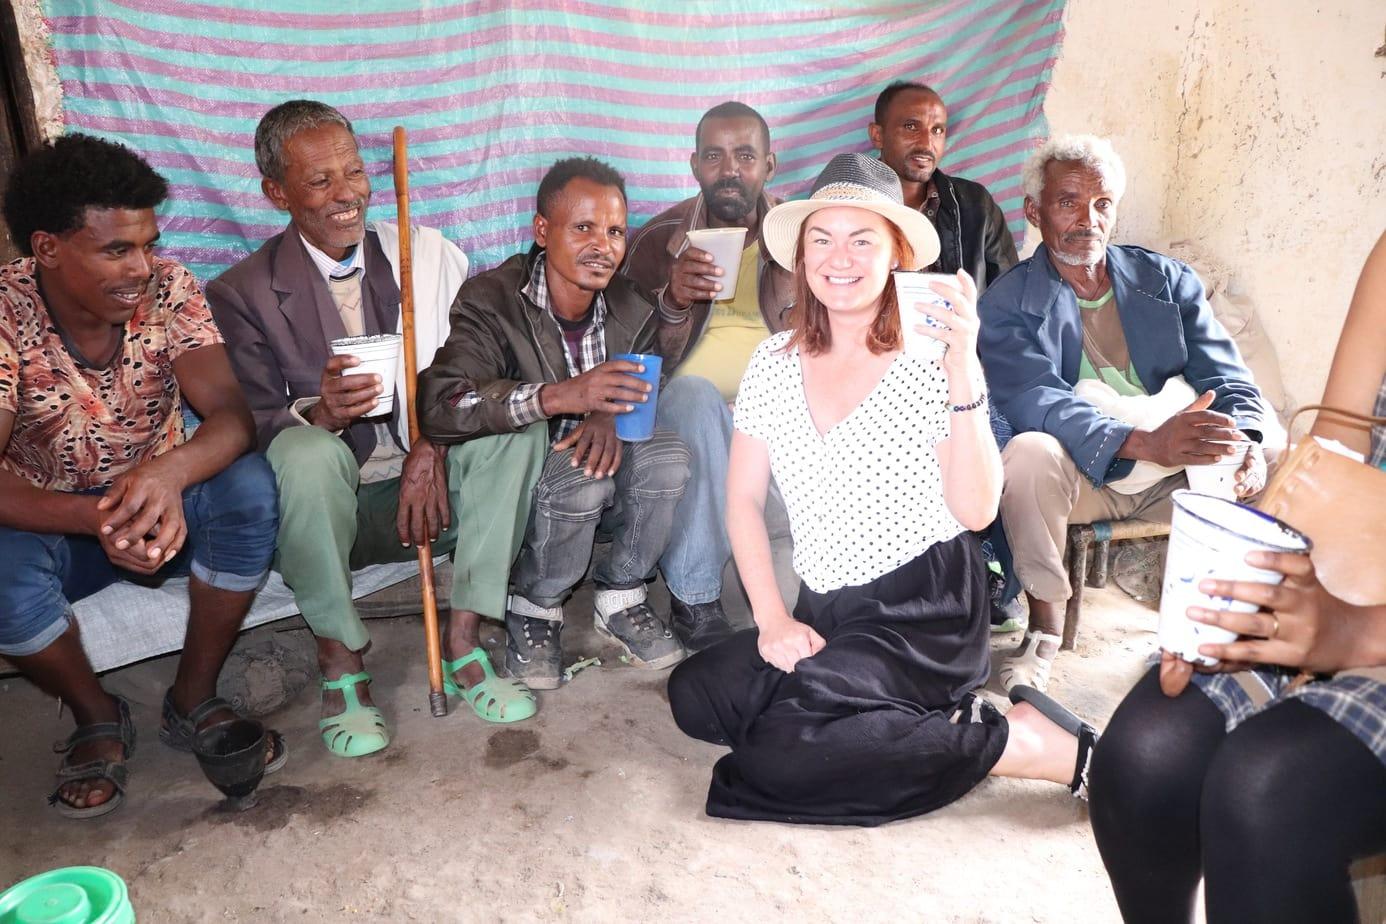 Drinking Tella in Ethiopia